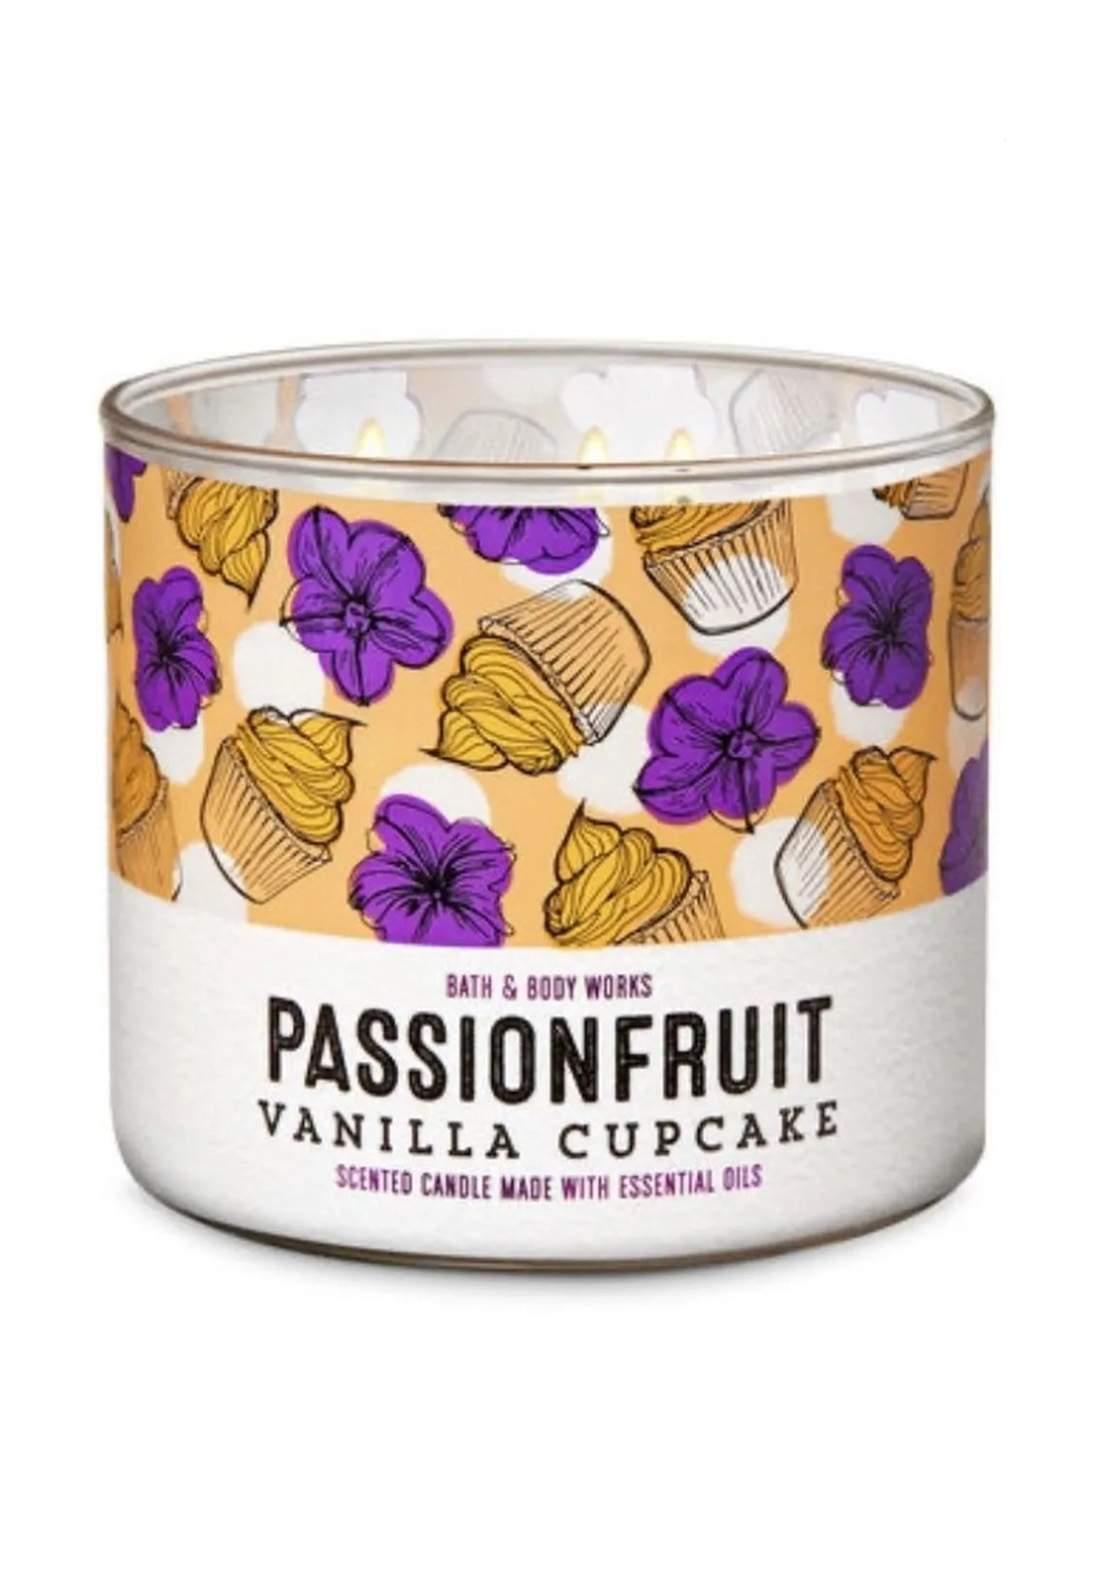 Bath And Body Works 3-Wick Candle - Passionfruit Vanilla Cupcake شمعة عطرية